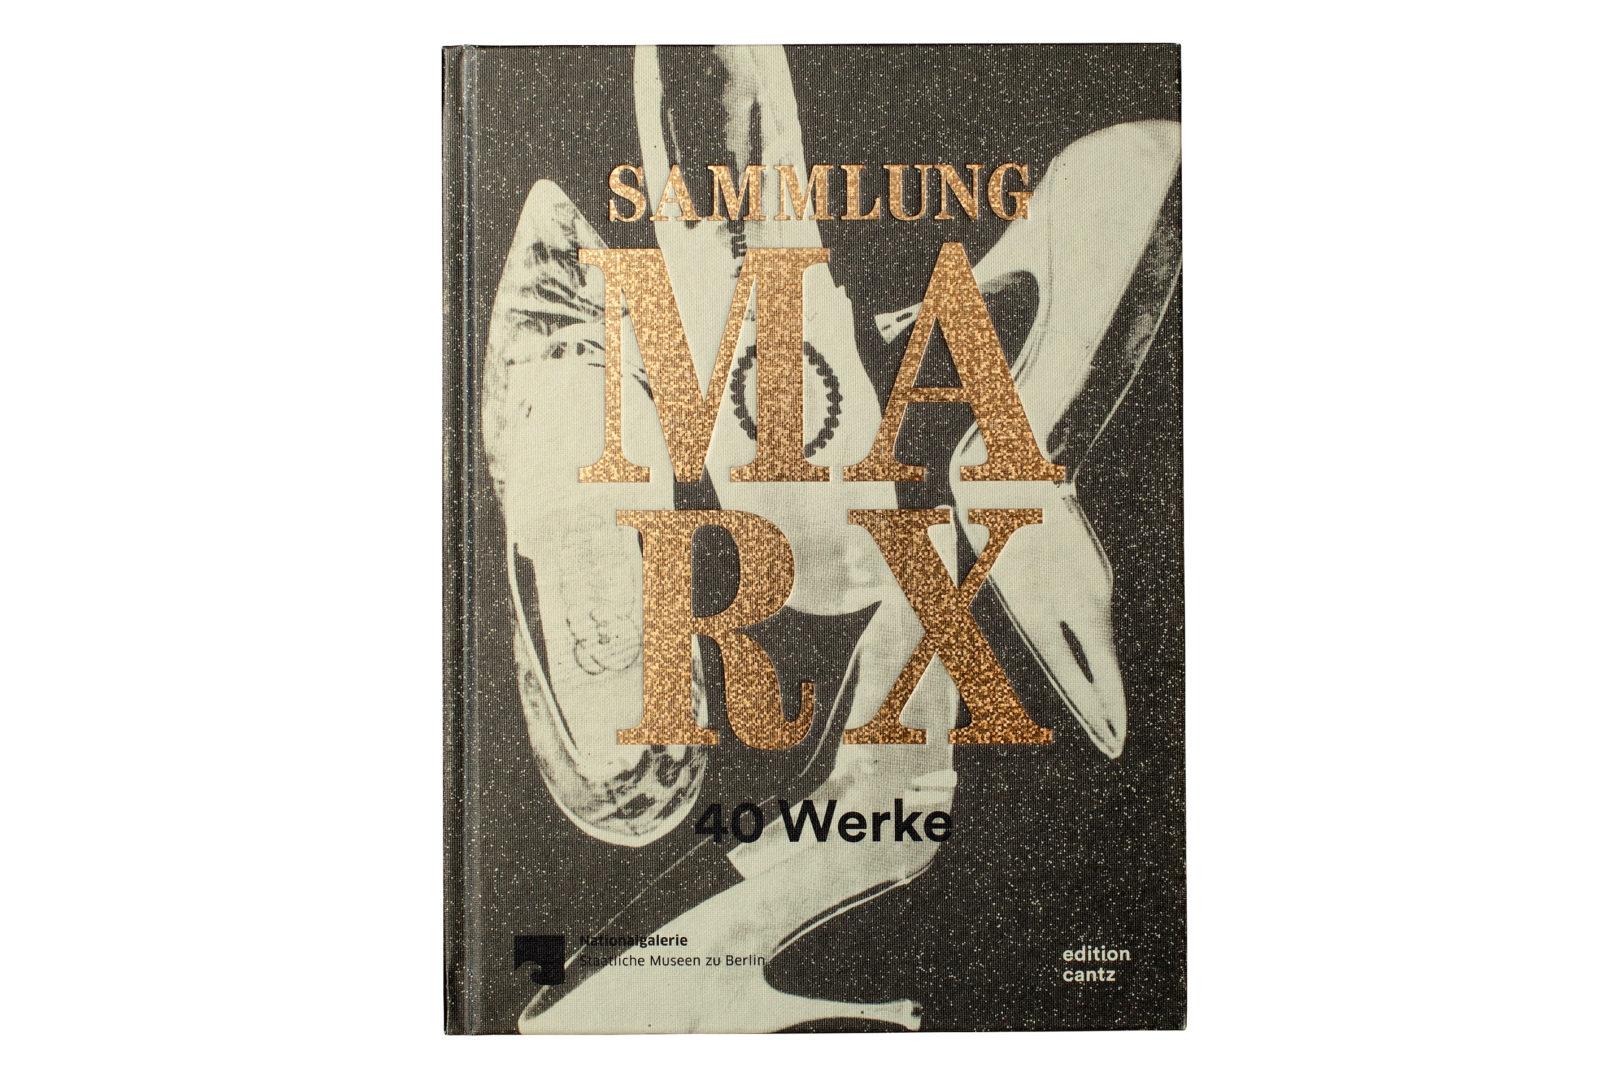 http://e-o-t.de/wordpress/wp-content/uploads/2020/06/Books-Marx-eot2.jpg